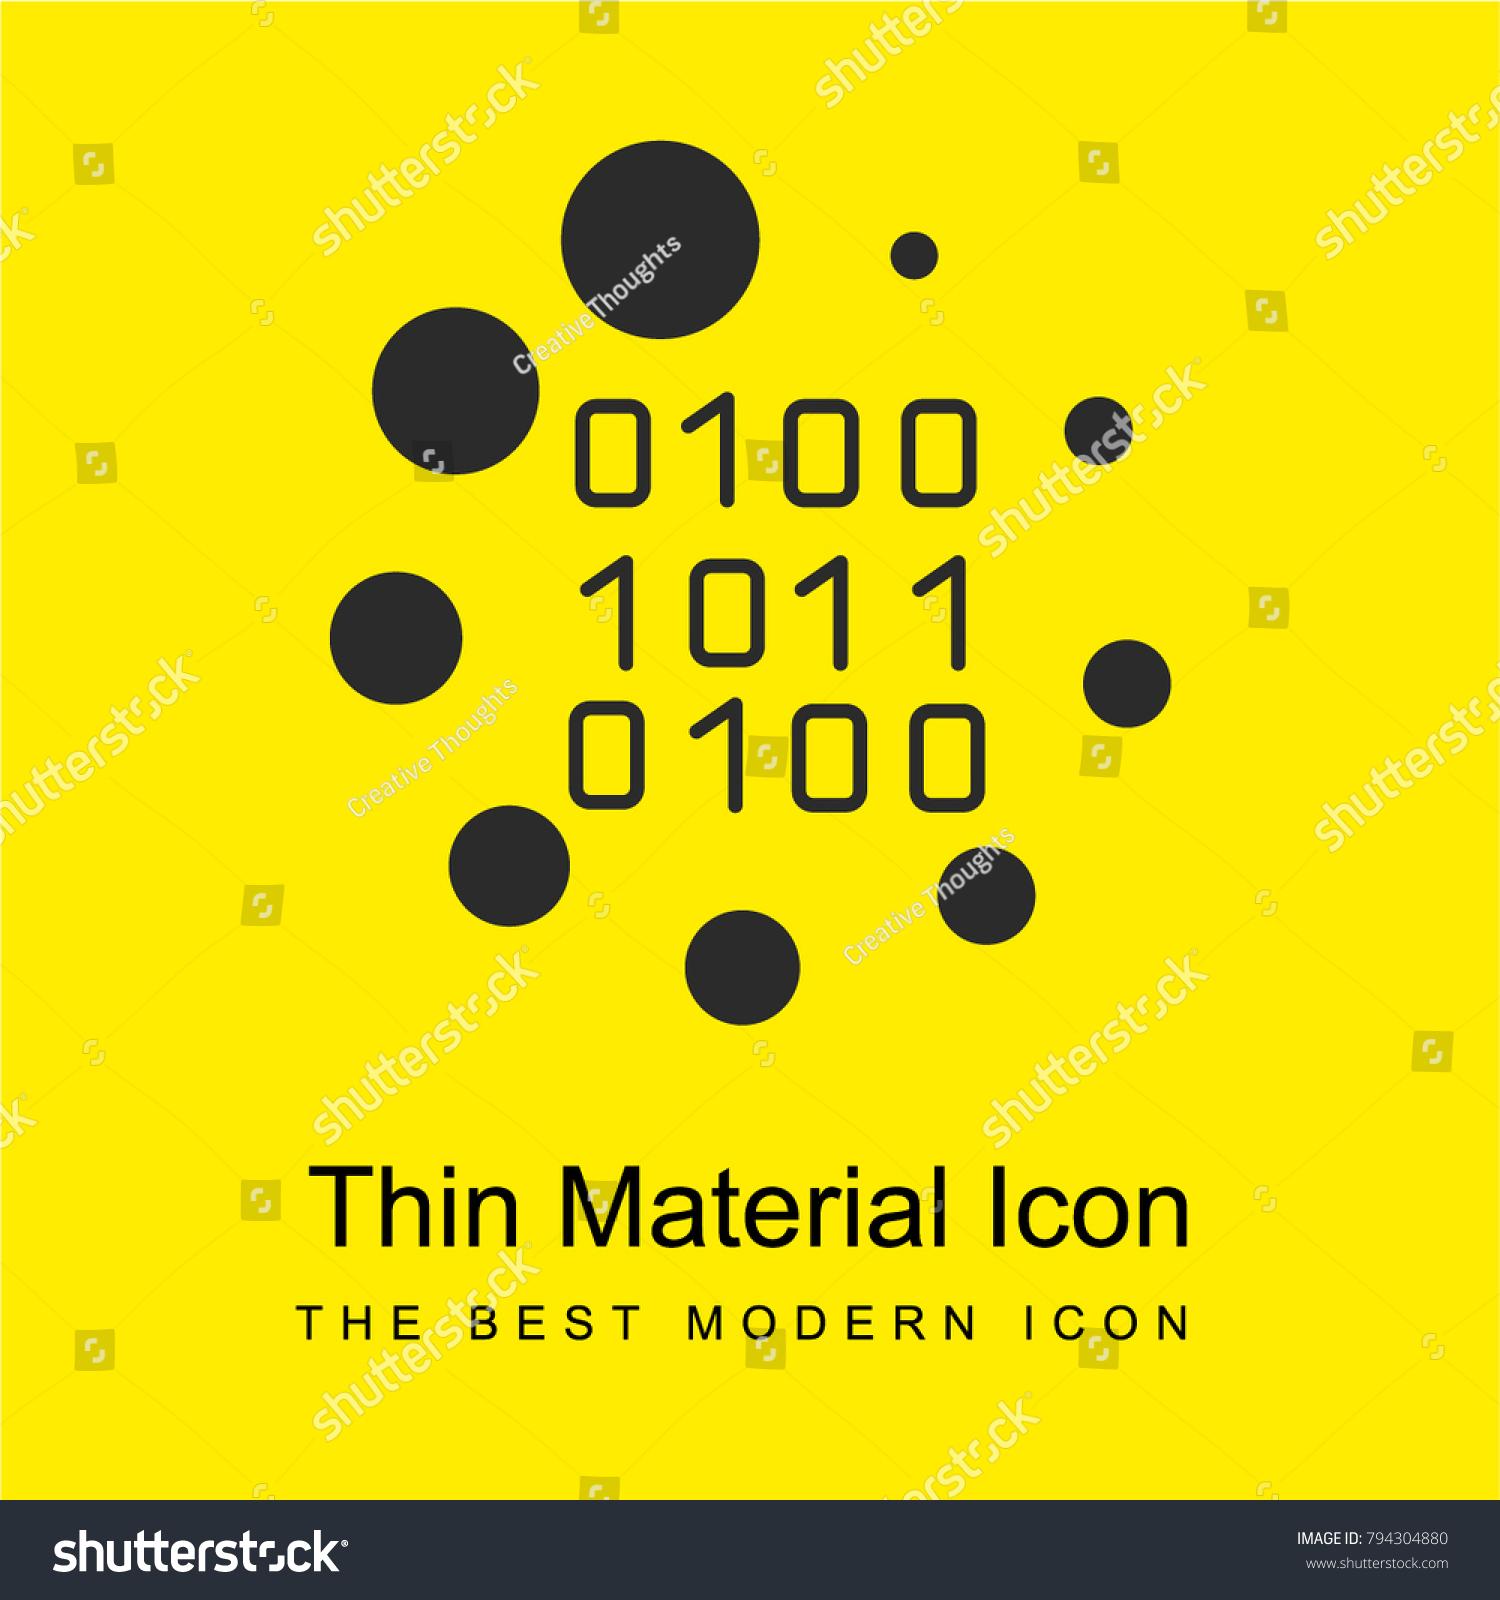 Binary code loading symbol bright yellow stock vector 794304880 binary code loading symbol bright yellow material minimal icon or logo design biocorpaavc Image collections